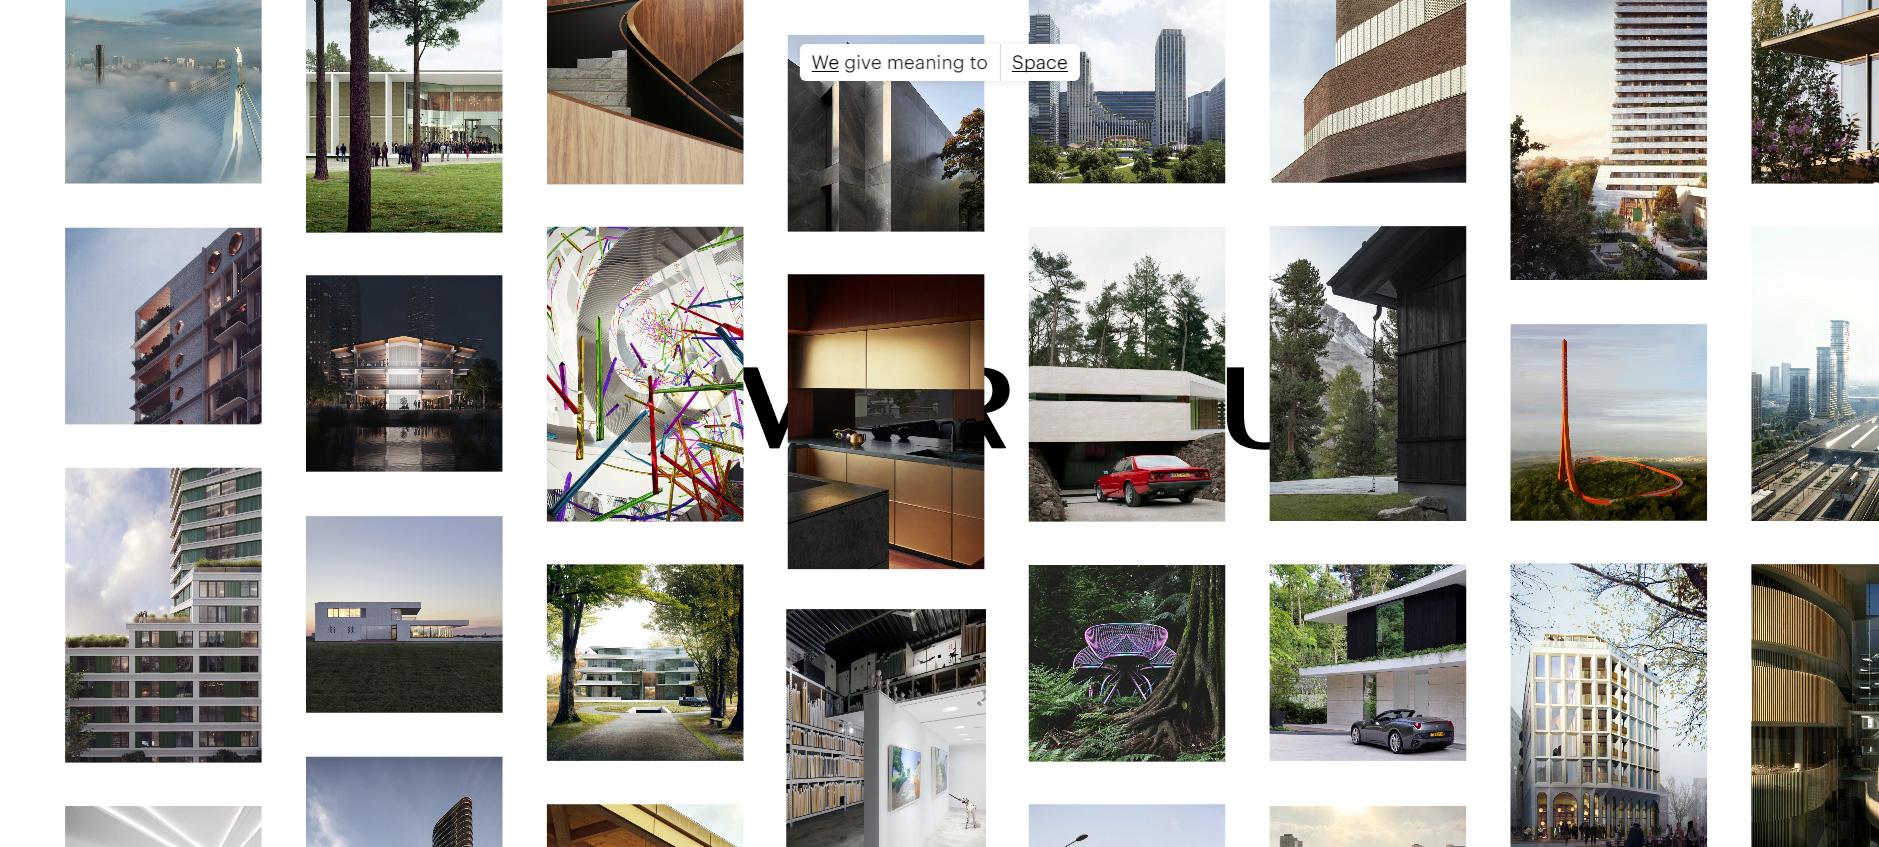 Powerhouse Company - Website of the Day